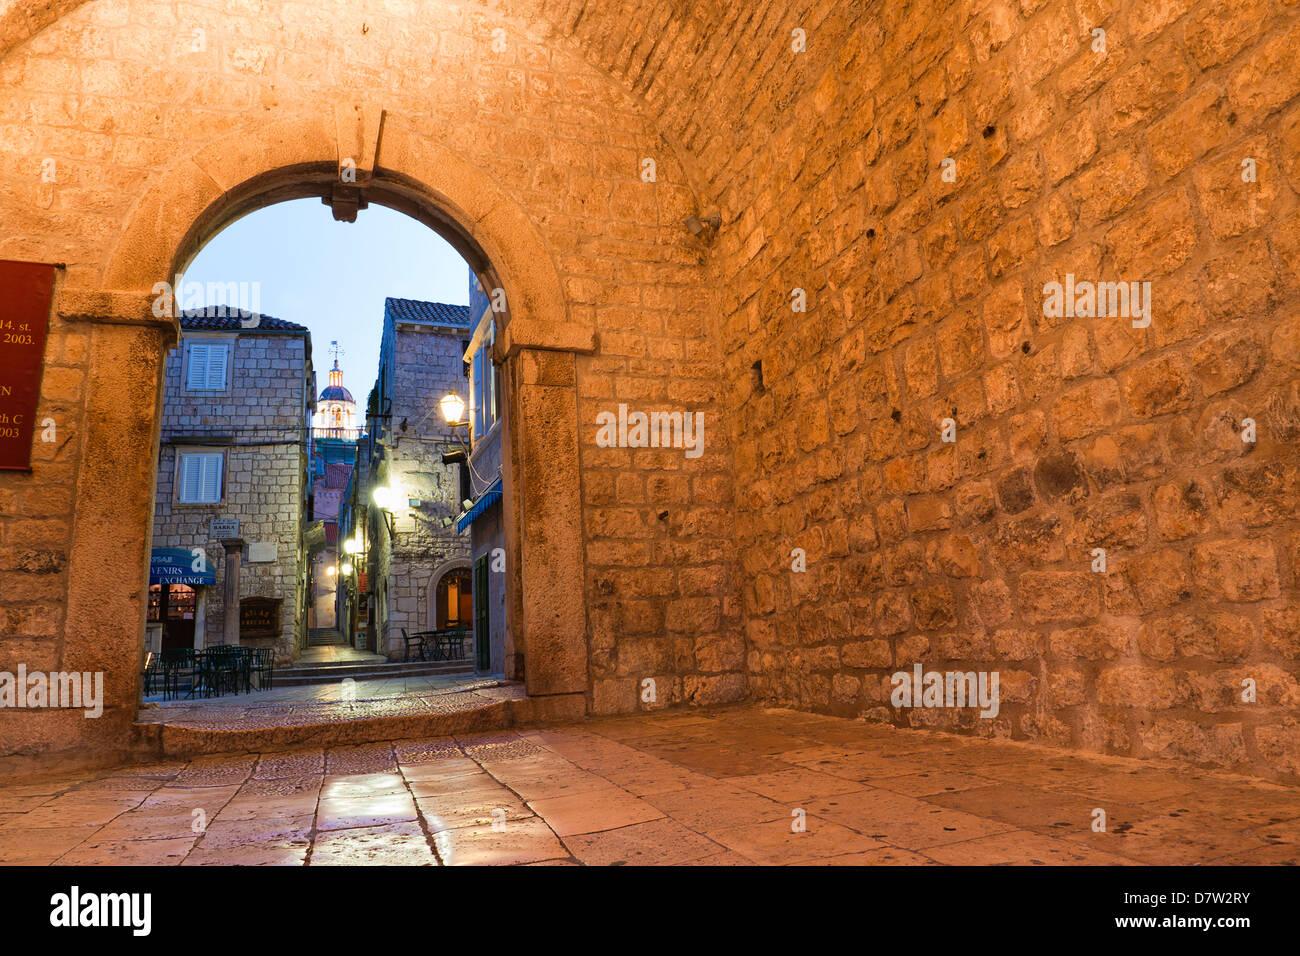 Korcula Revelin, die Eingang in Korcula Altstadt bei Nacht, Insel Korcula, Dalmatien, Kroatien Stockbild